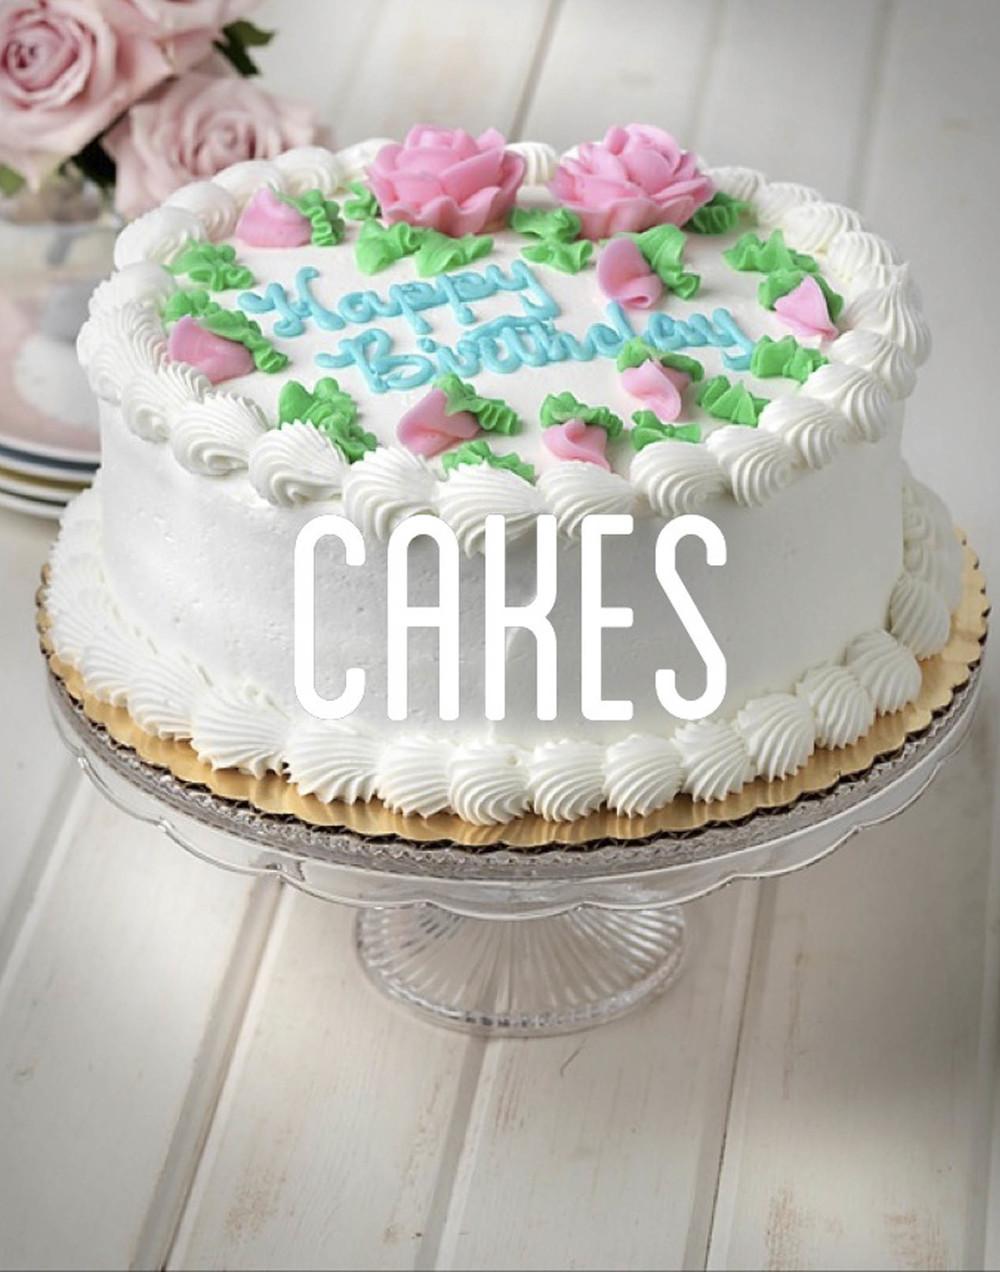 Cakes_Wixey_Bakery2.jpg